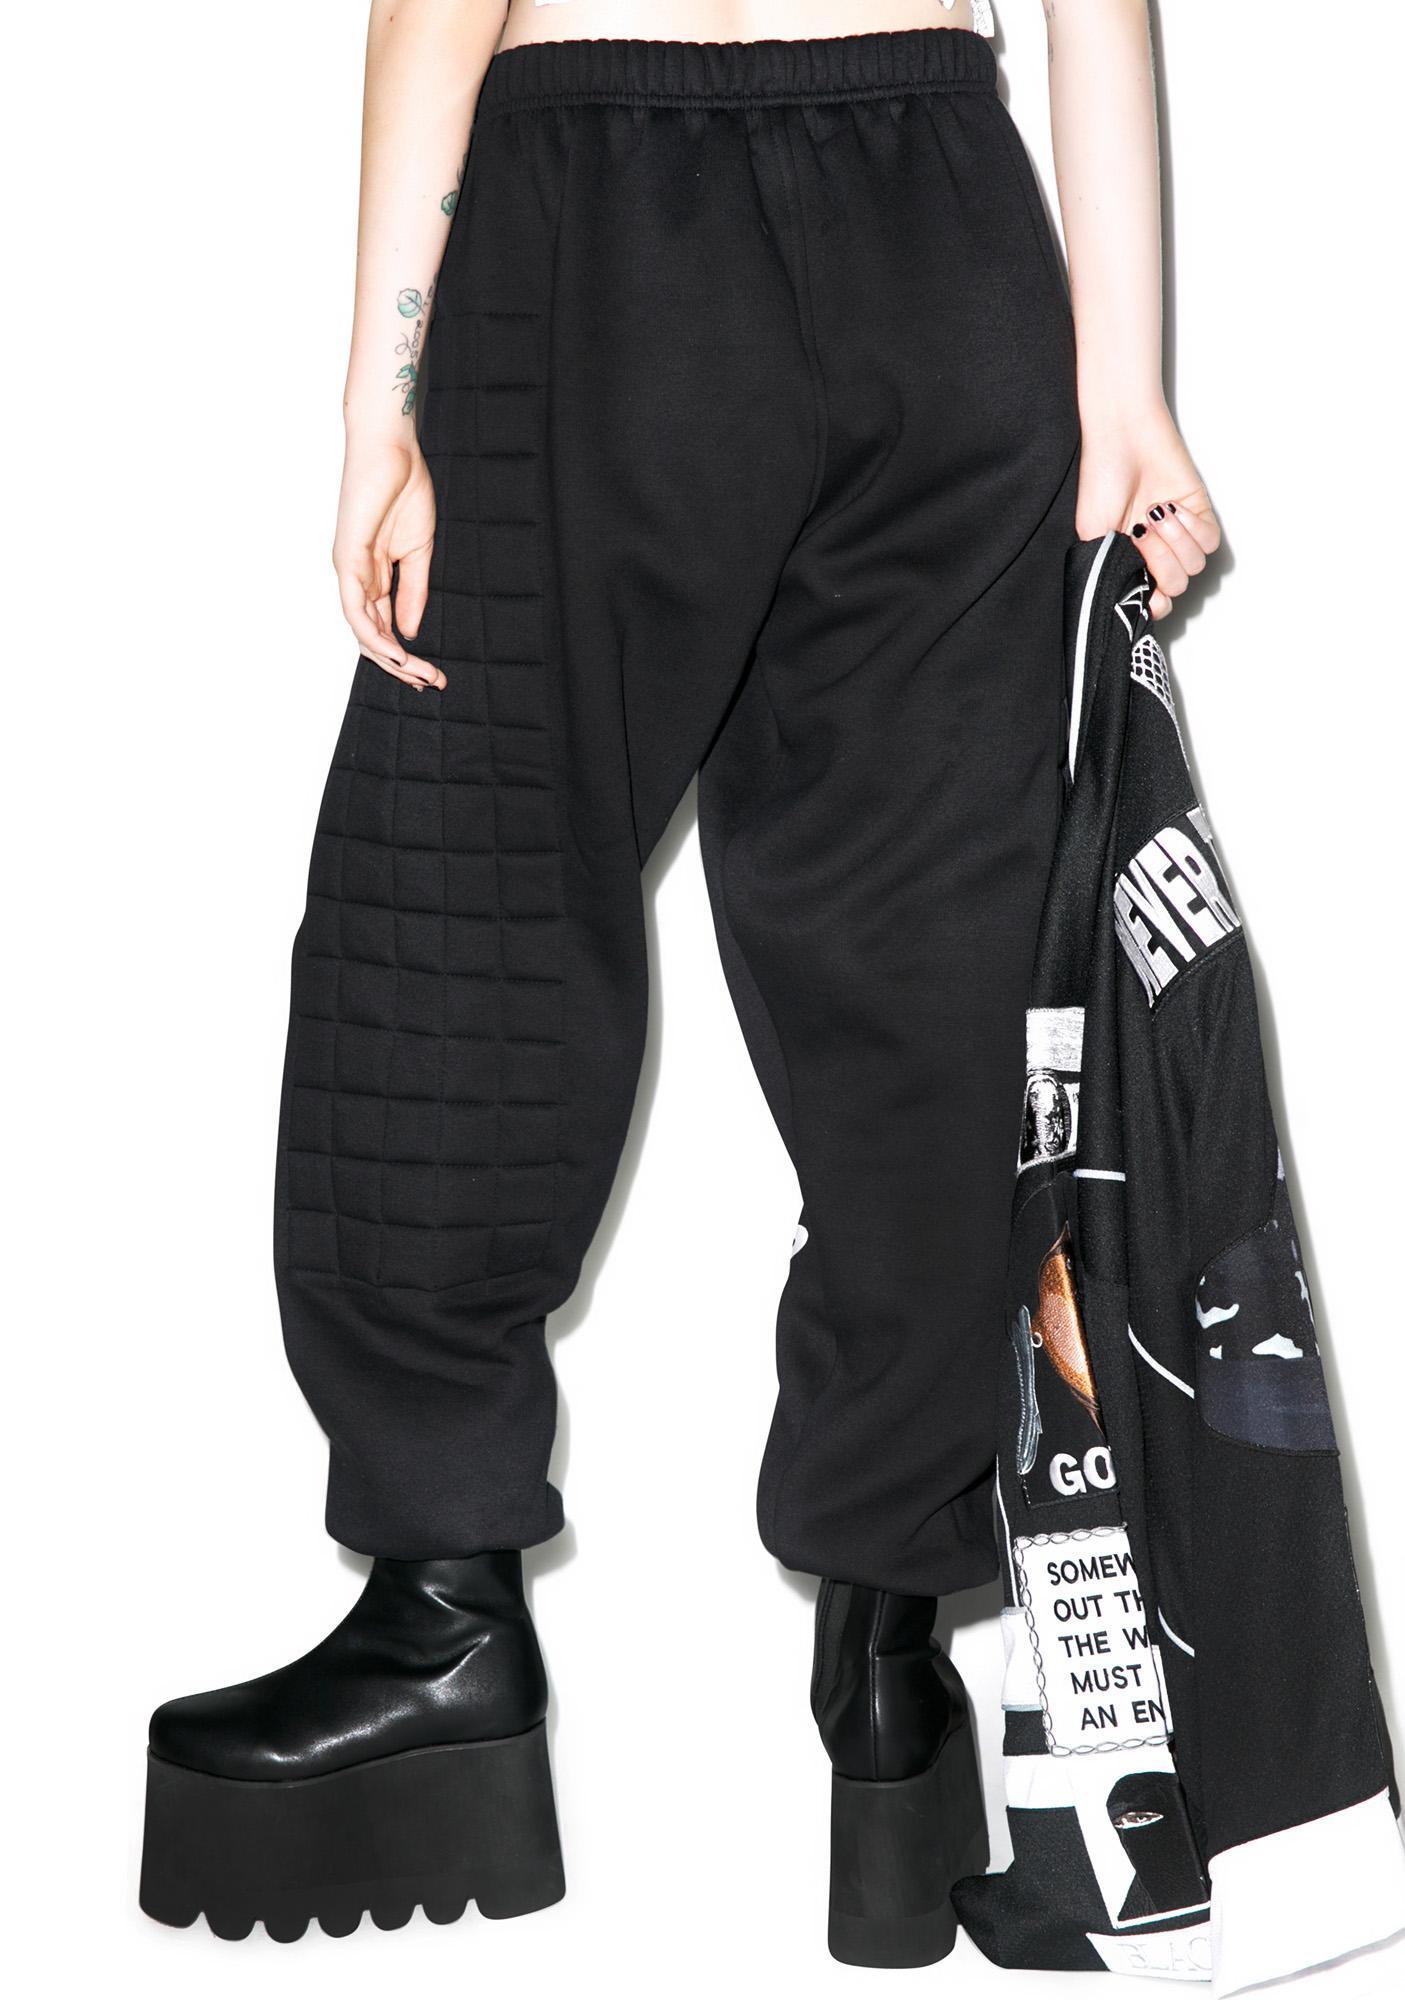 W.I.A Black Padding Sweat Pants